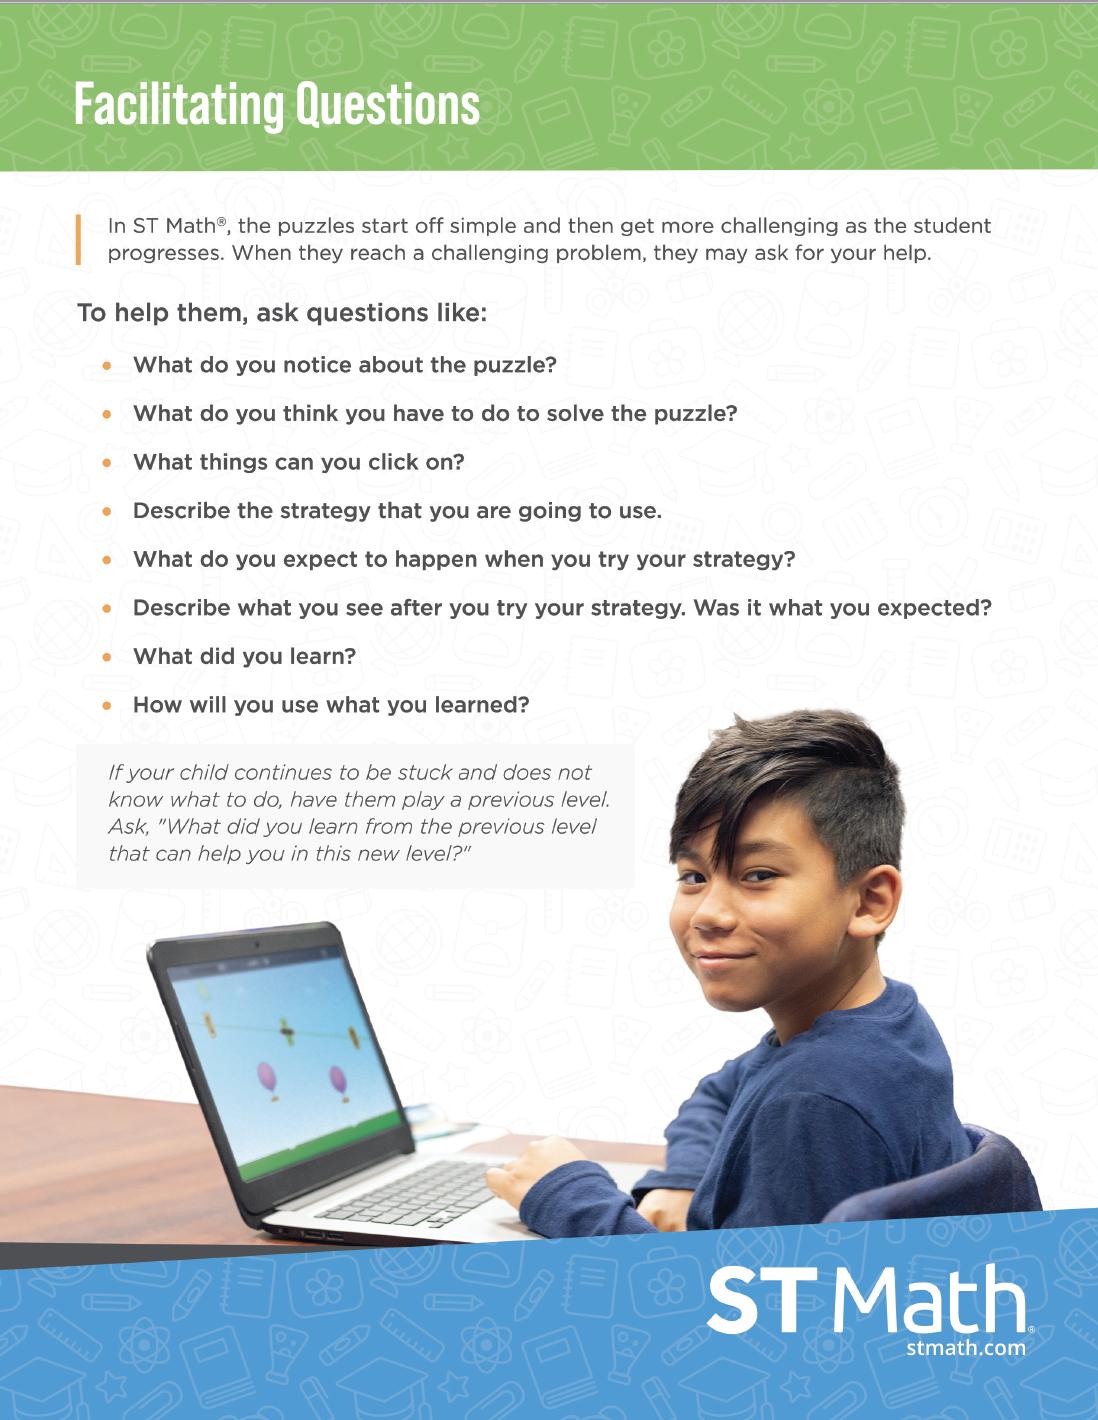 facilitating-questions-poster-st-math